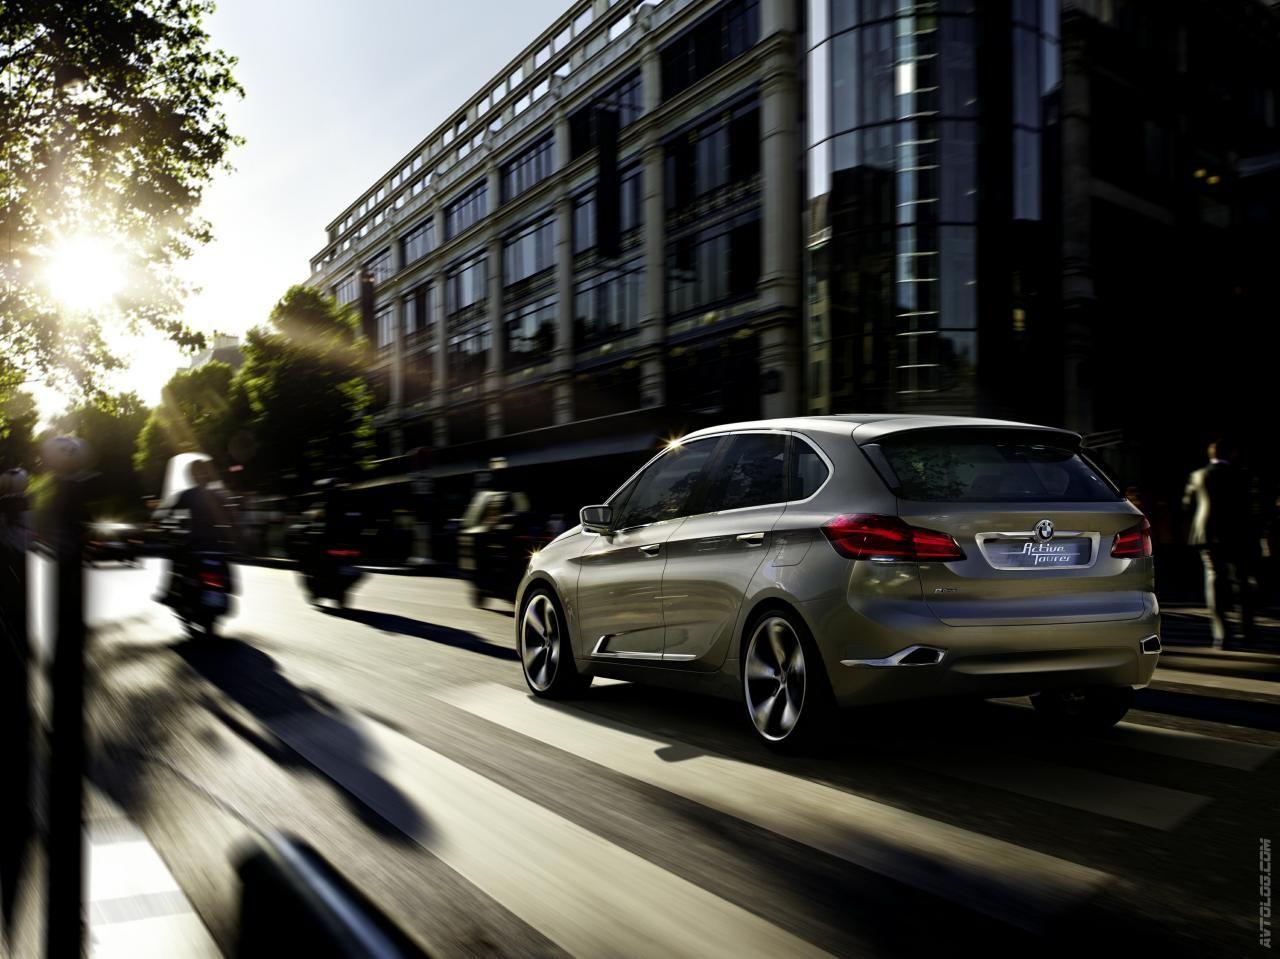 2012 BMW Concept Active Tourer | BMW | Pinterest | Bmw concept and BMW